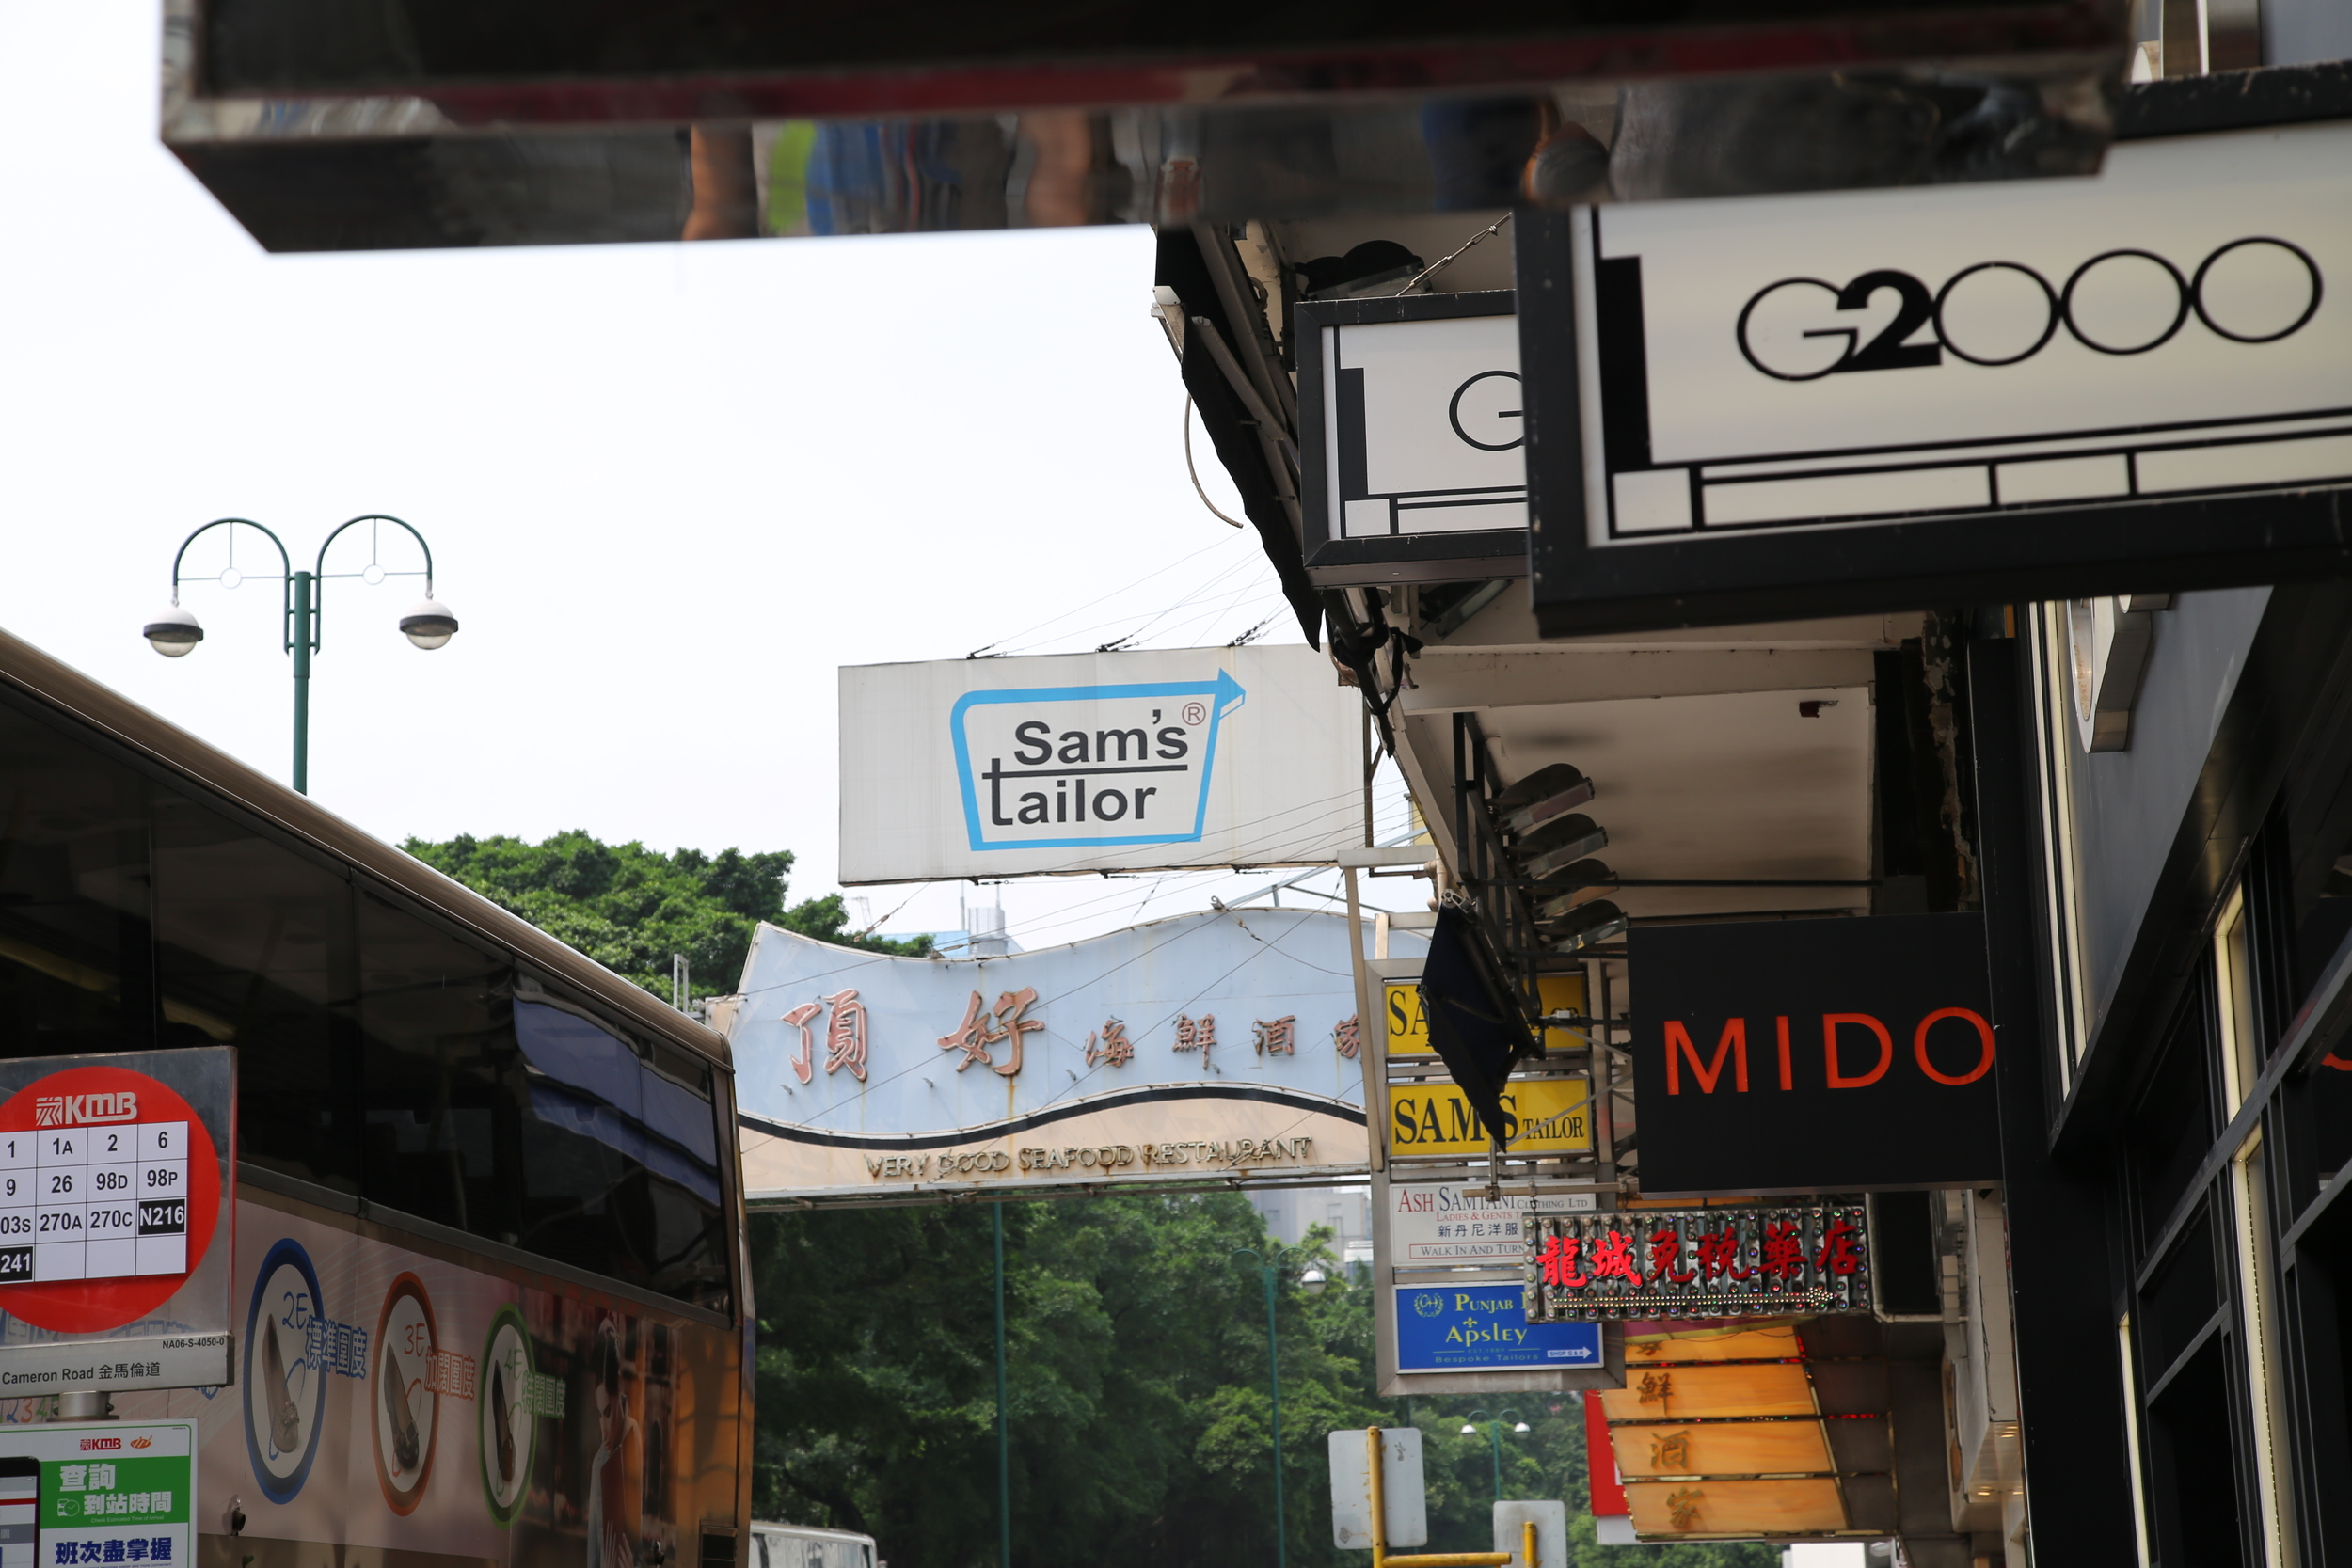 Sams Tailor ,Tsim Sha Tsui, Kowloon